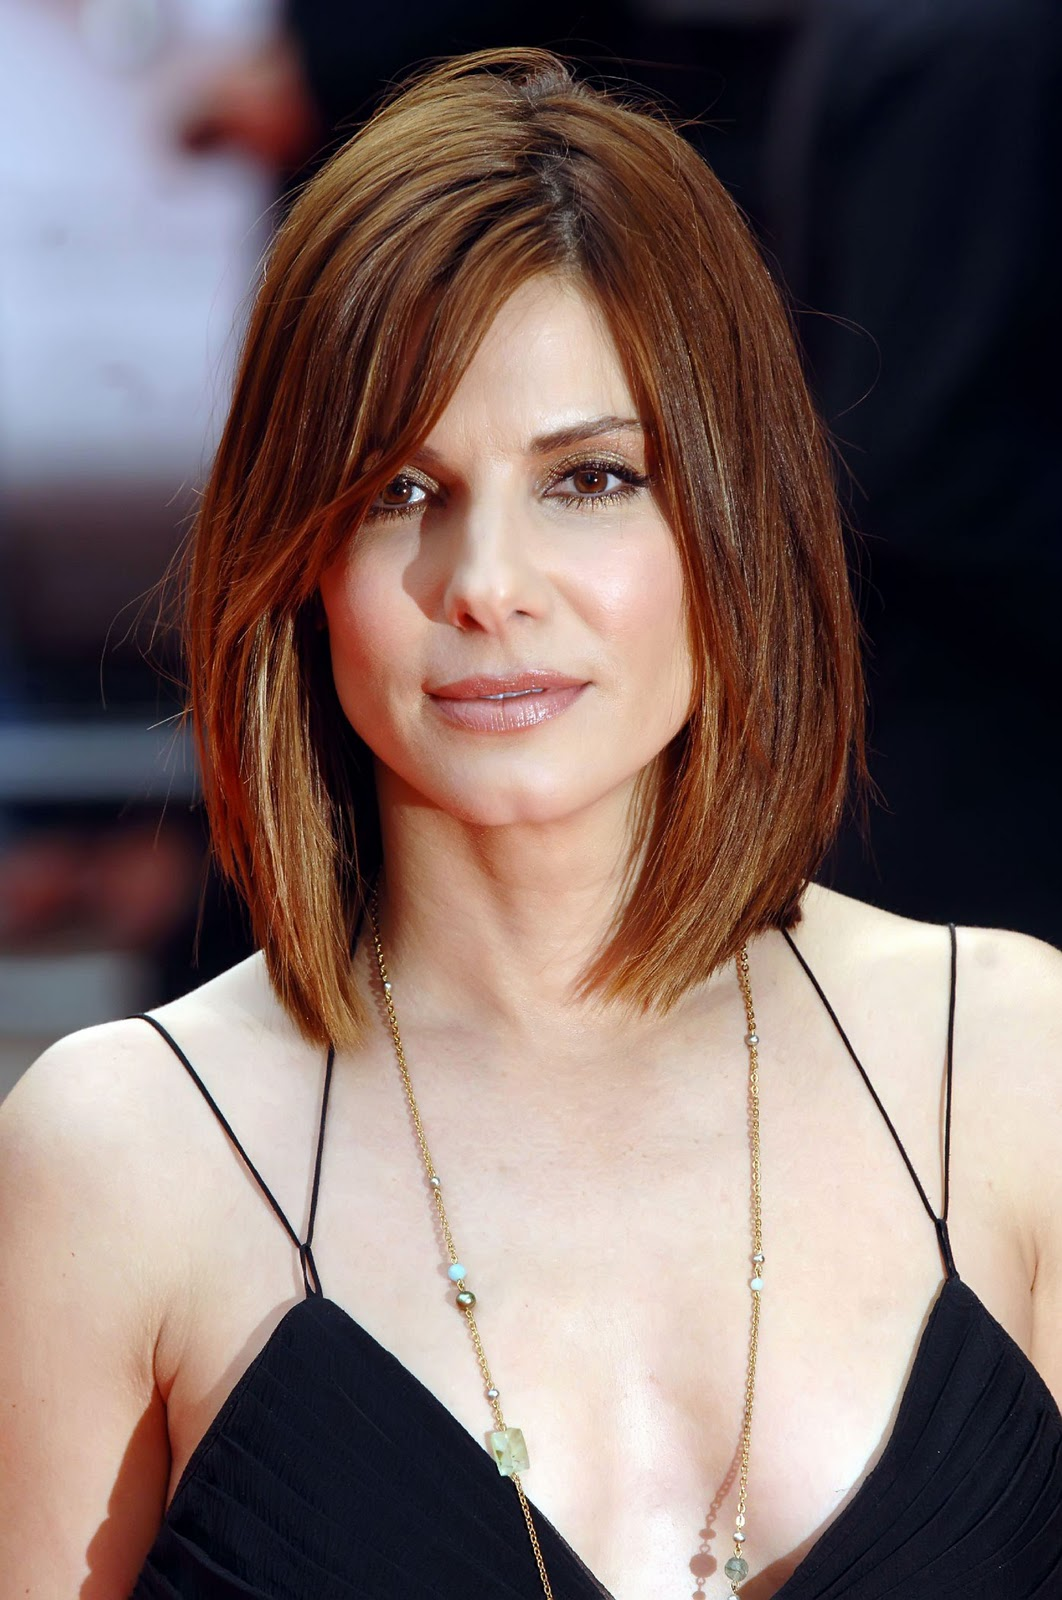 http://2.bp.blogspot.com/-S6_BjrNuUrI/Tt8-Jiu_S5I/AAAAAAAABDw/6_A7CH8ezPA/s1600/Sandra-Bullock-actress-film-movies-oscar-pics-images-photos-heroine-hairstyle-+%25289%2529.jpg